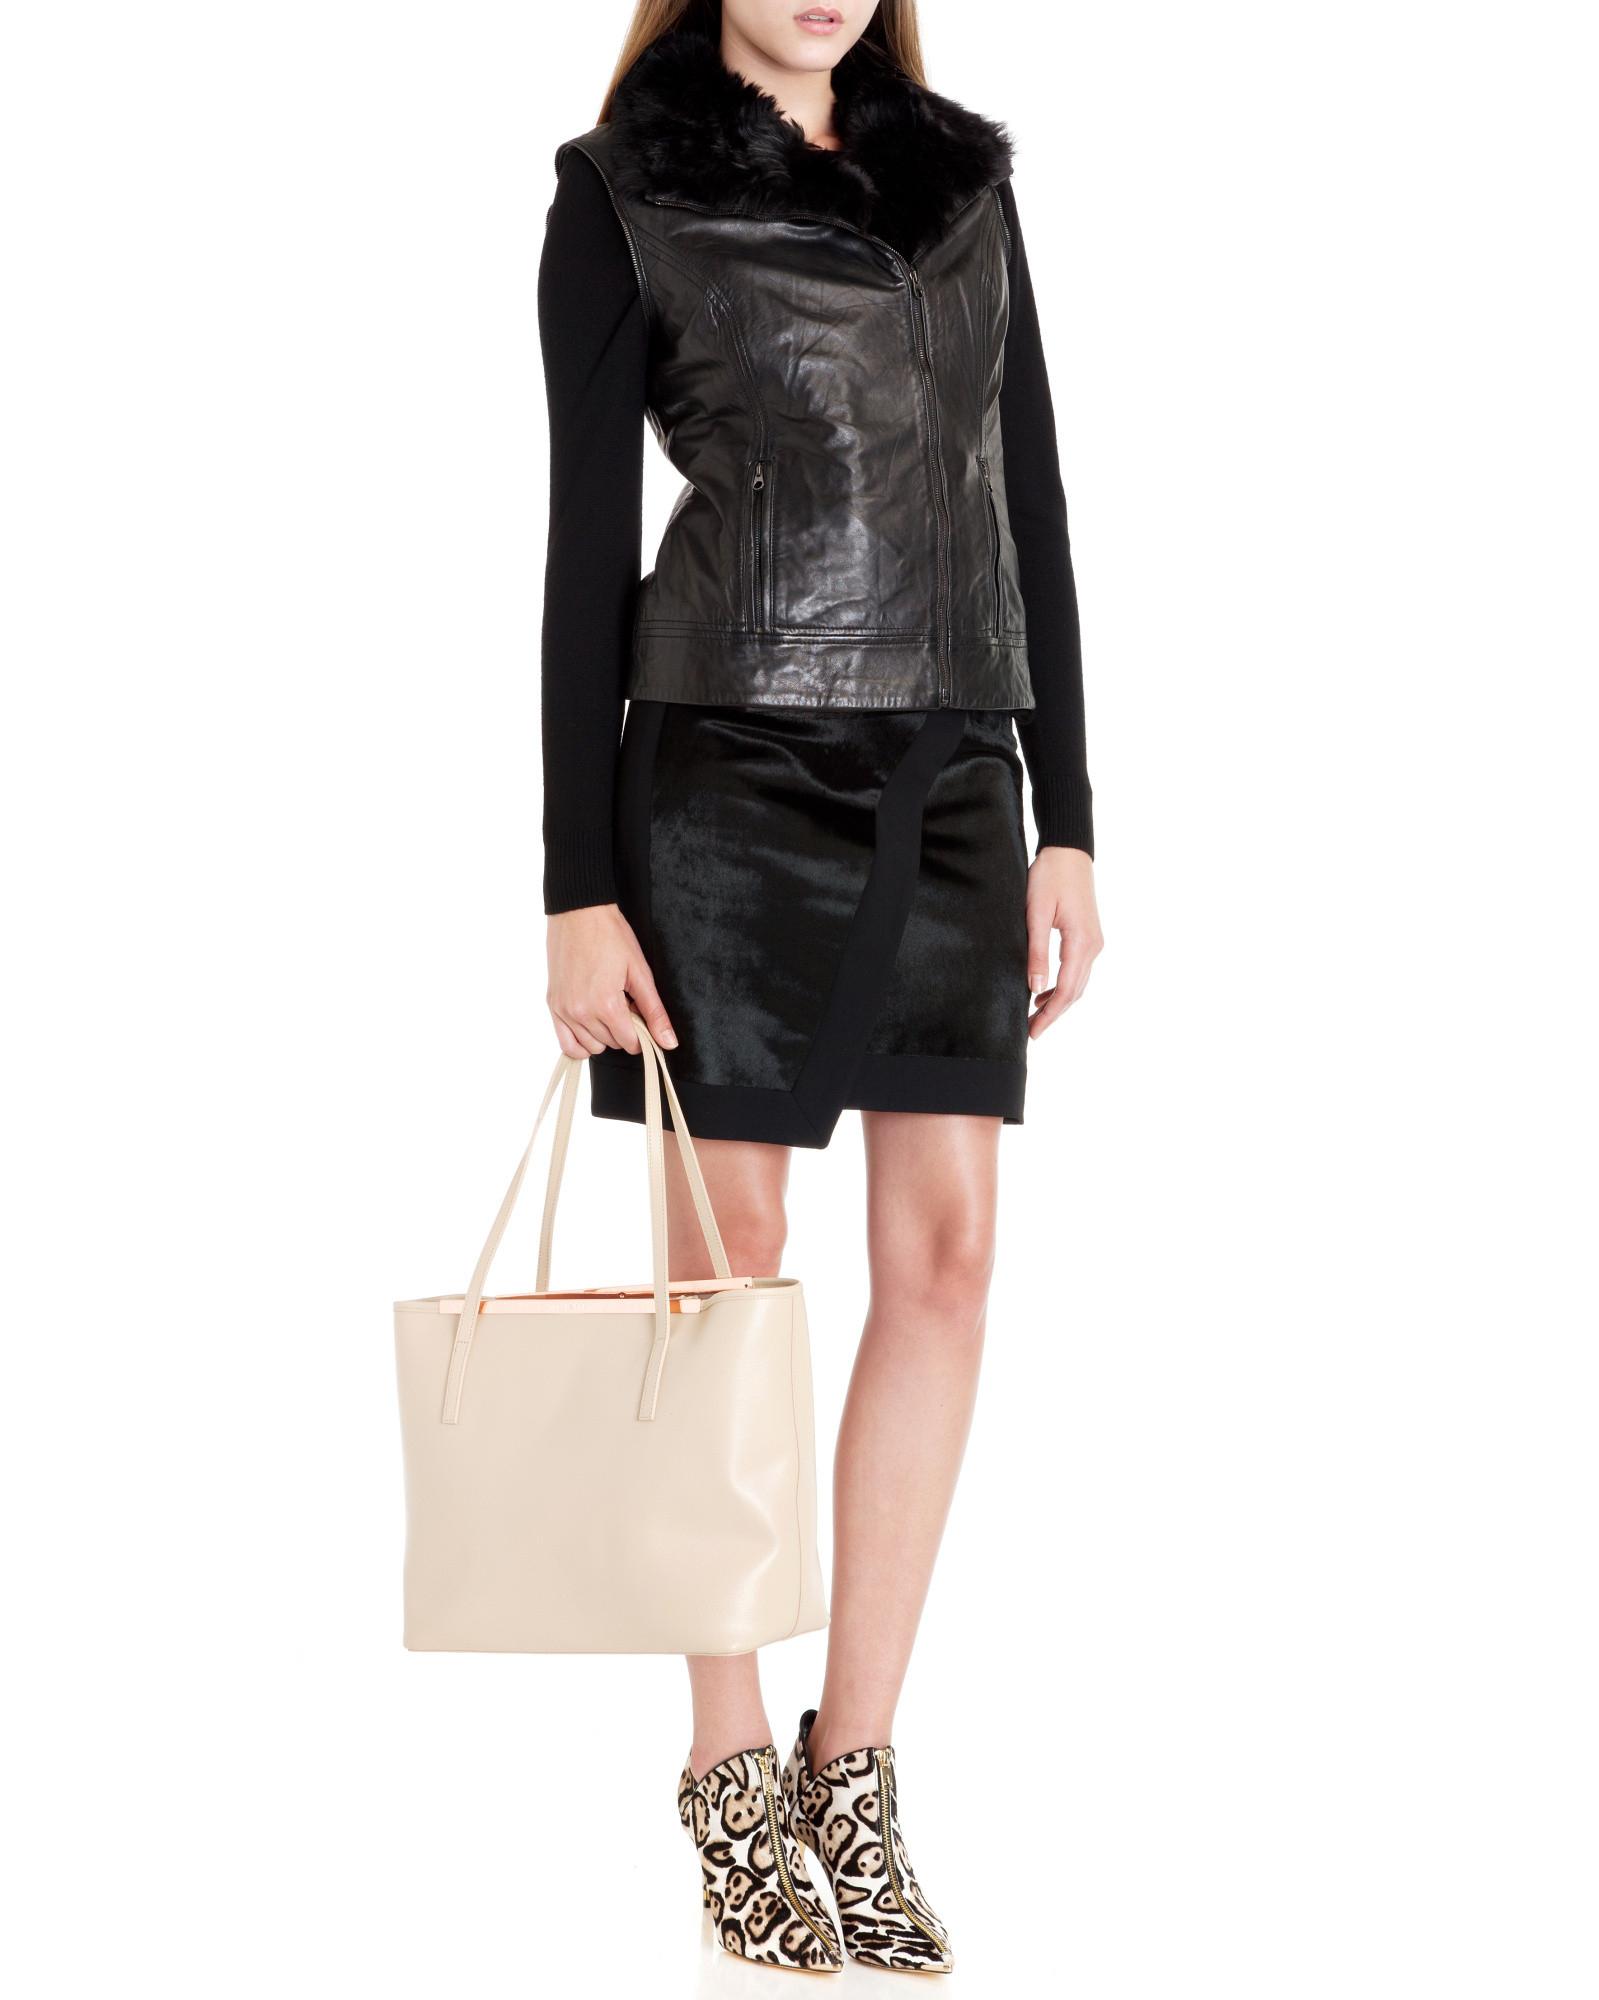 e49cfea22 Lyst - Ted Baker Pony Skin Effect Leather Mini Skirt in Black